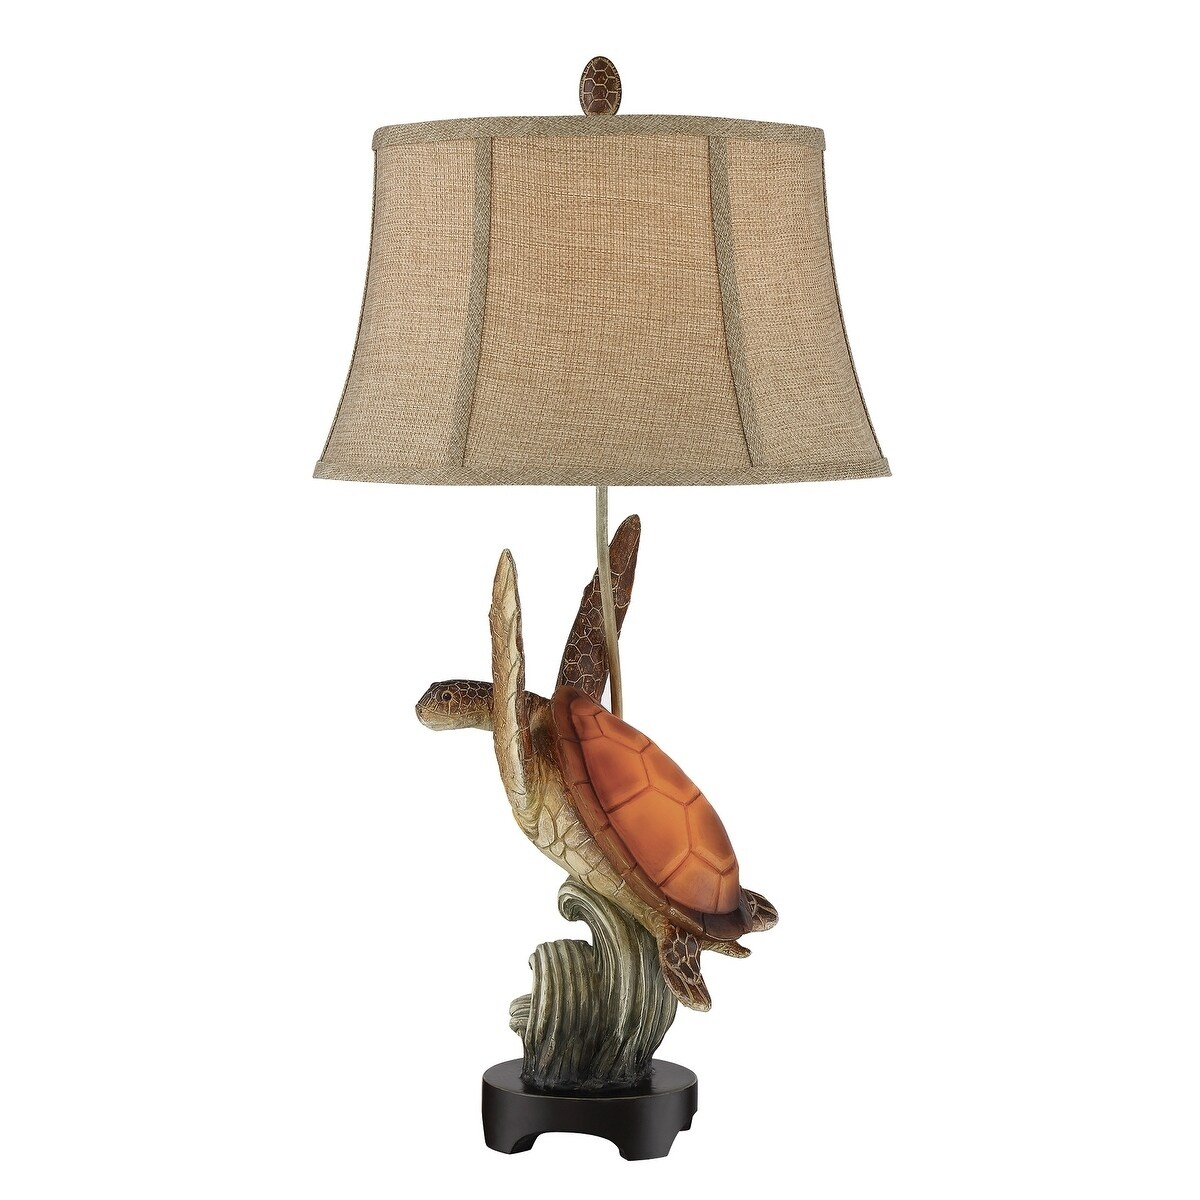 "Seahaven Cruising Turtle Night Light Table Lamp 33"" high,..."